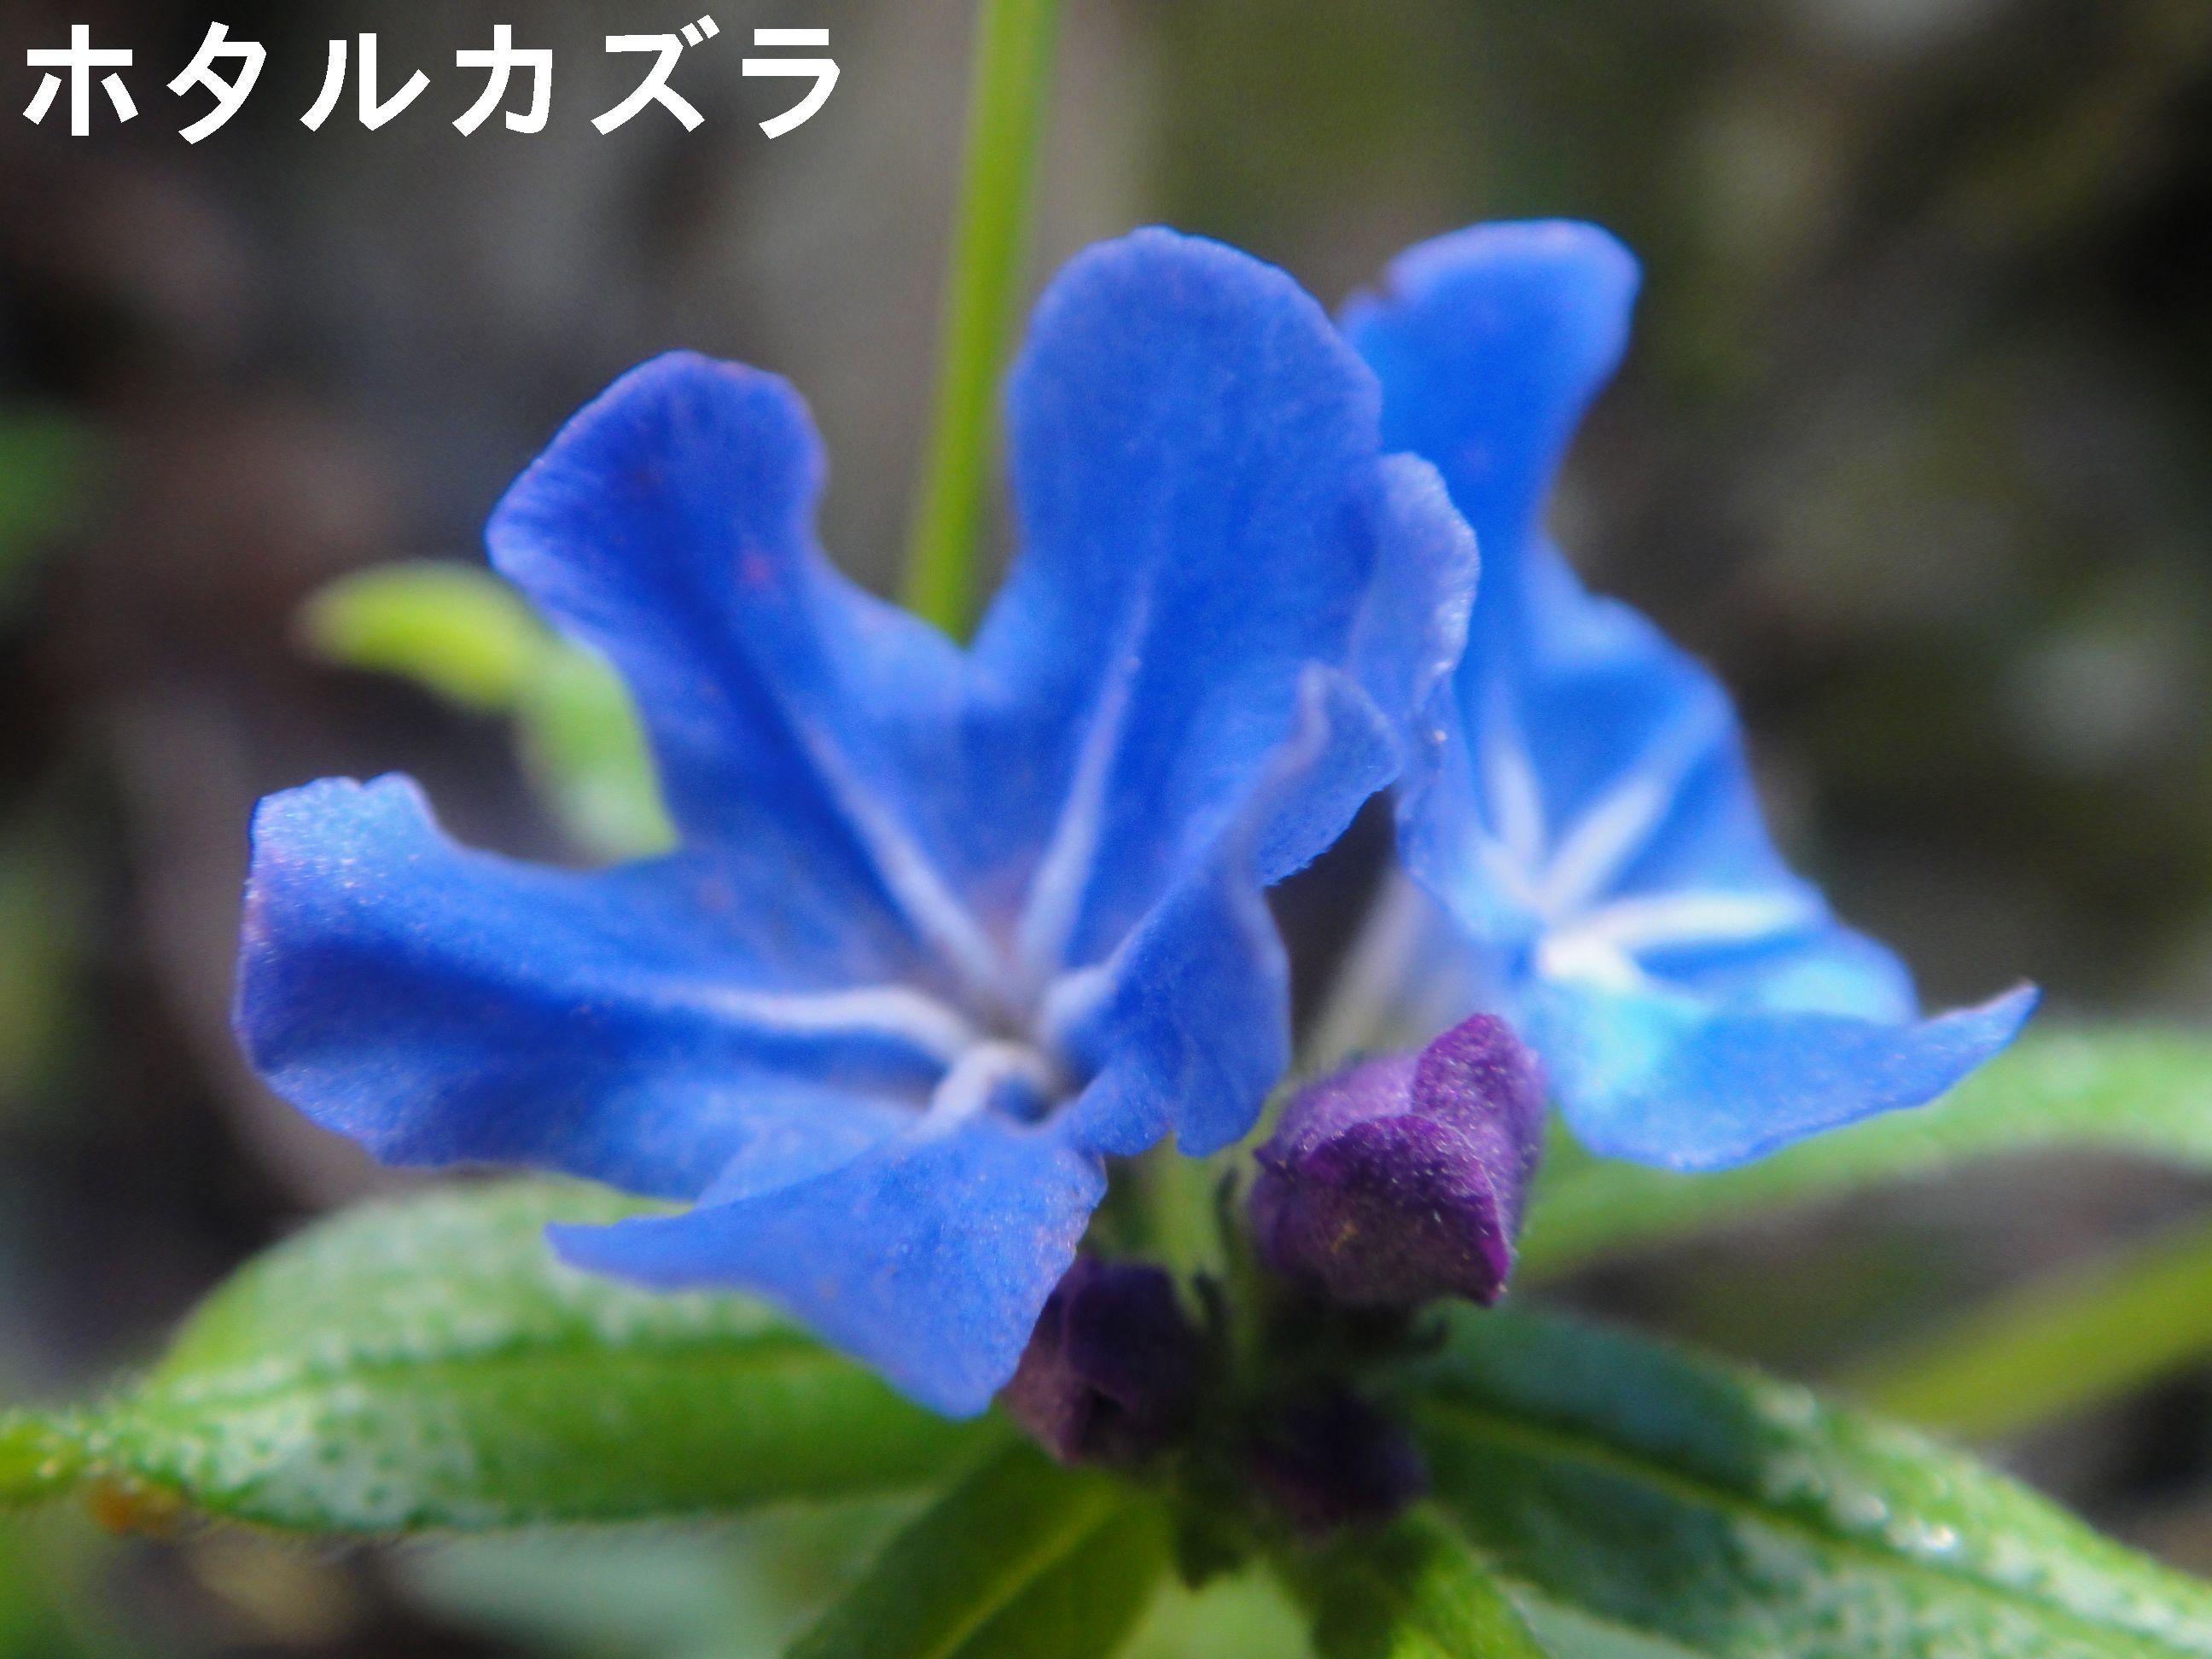 平成23年度定期総会 in 孝子の森_c0108460_221349100.jpg